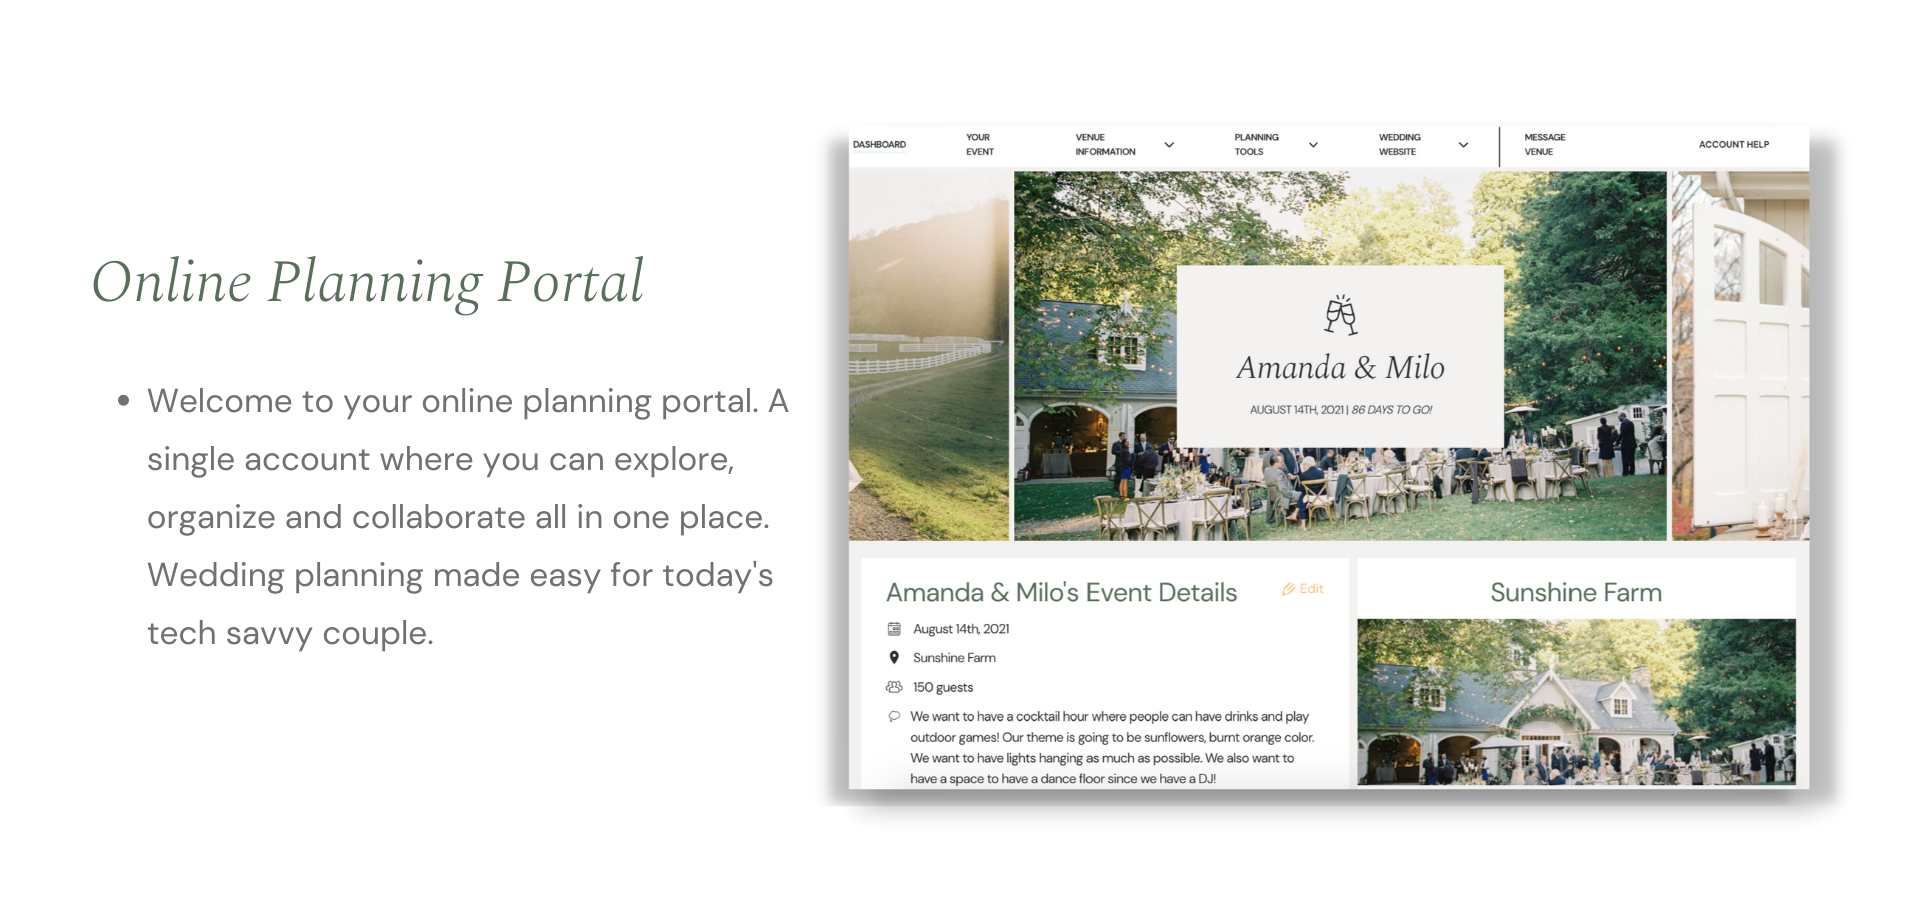 Online Planning Portal